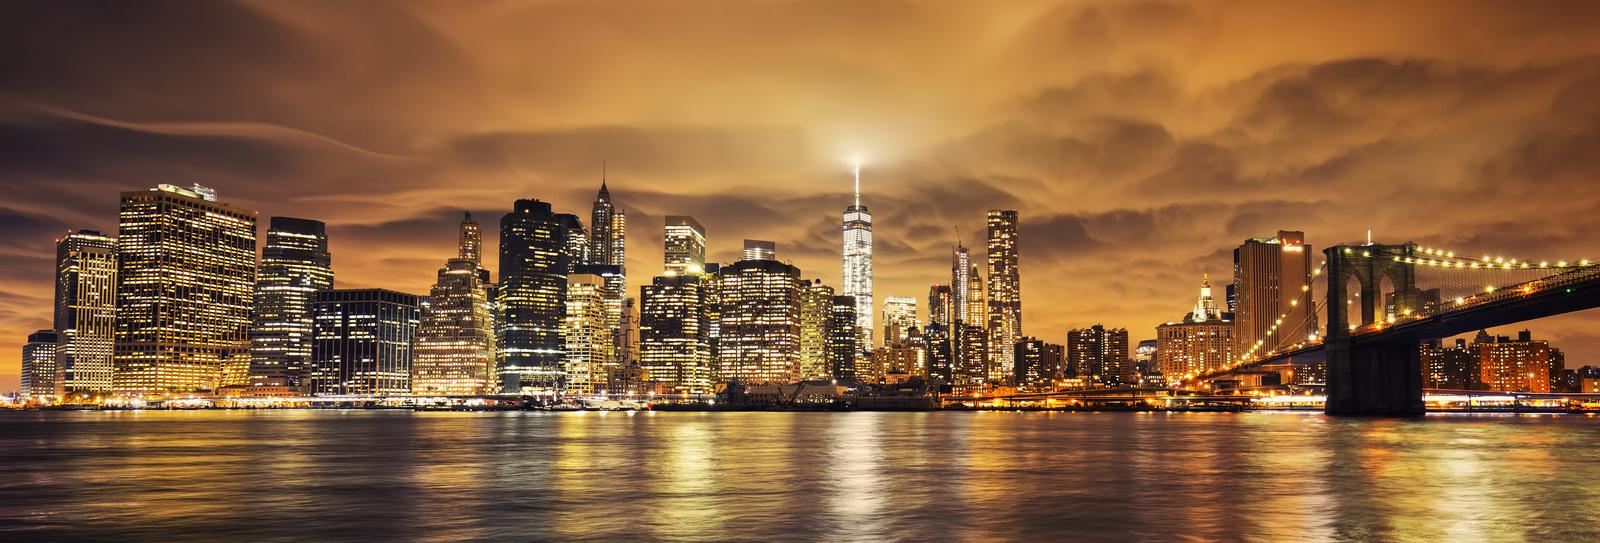 East Village Manhattan, NY Private Investigator